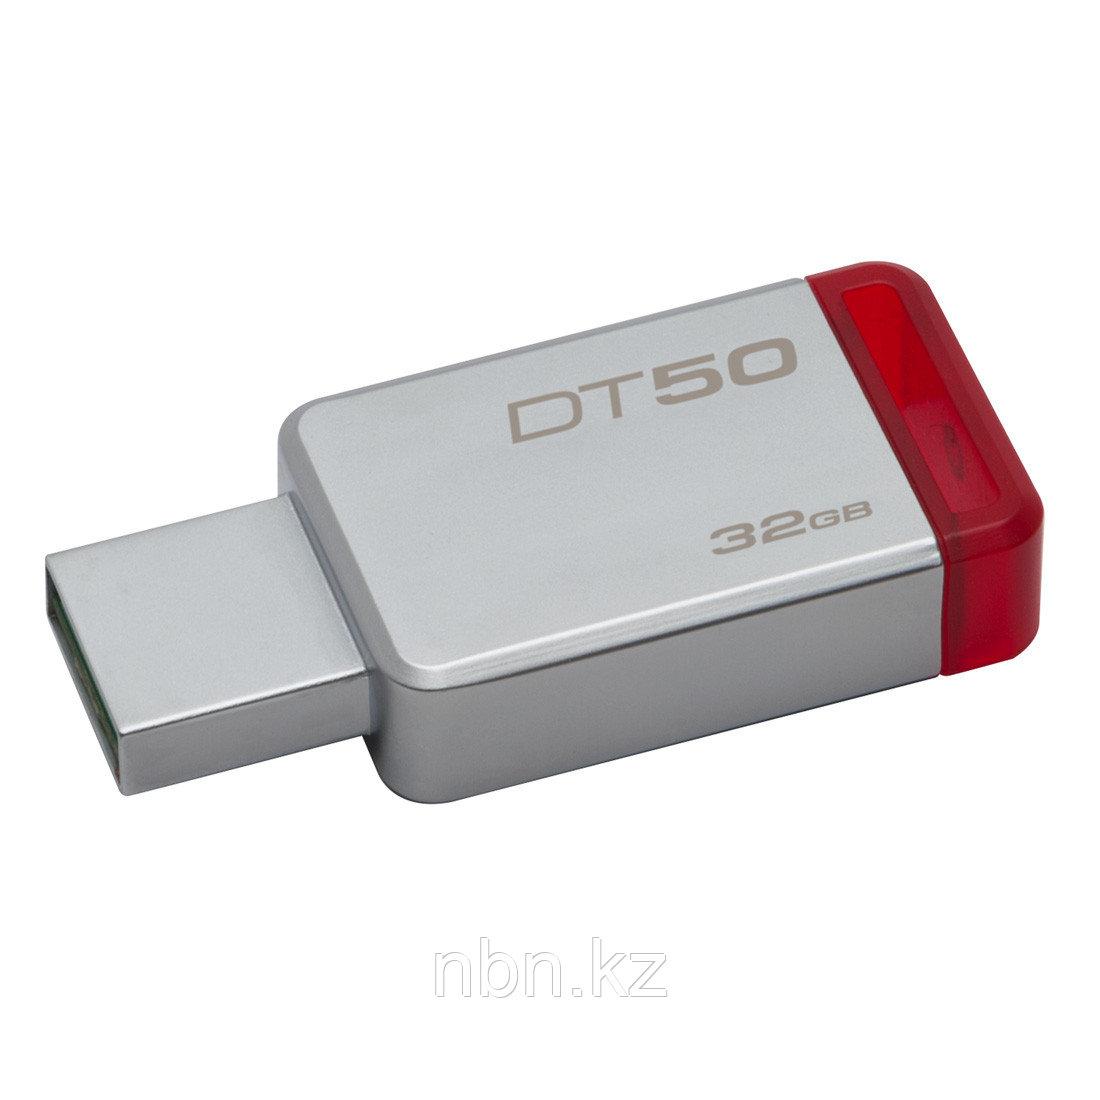 USB-накопитель Kingston DataTraveler® 50  (DT50) 32GB